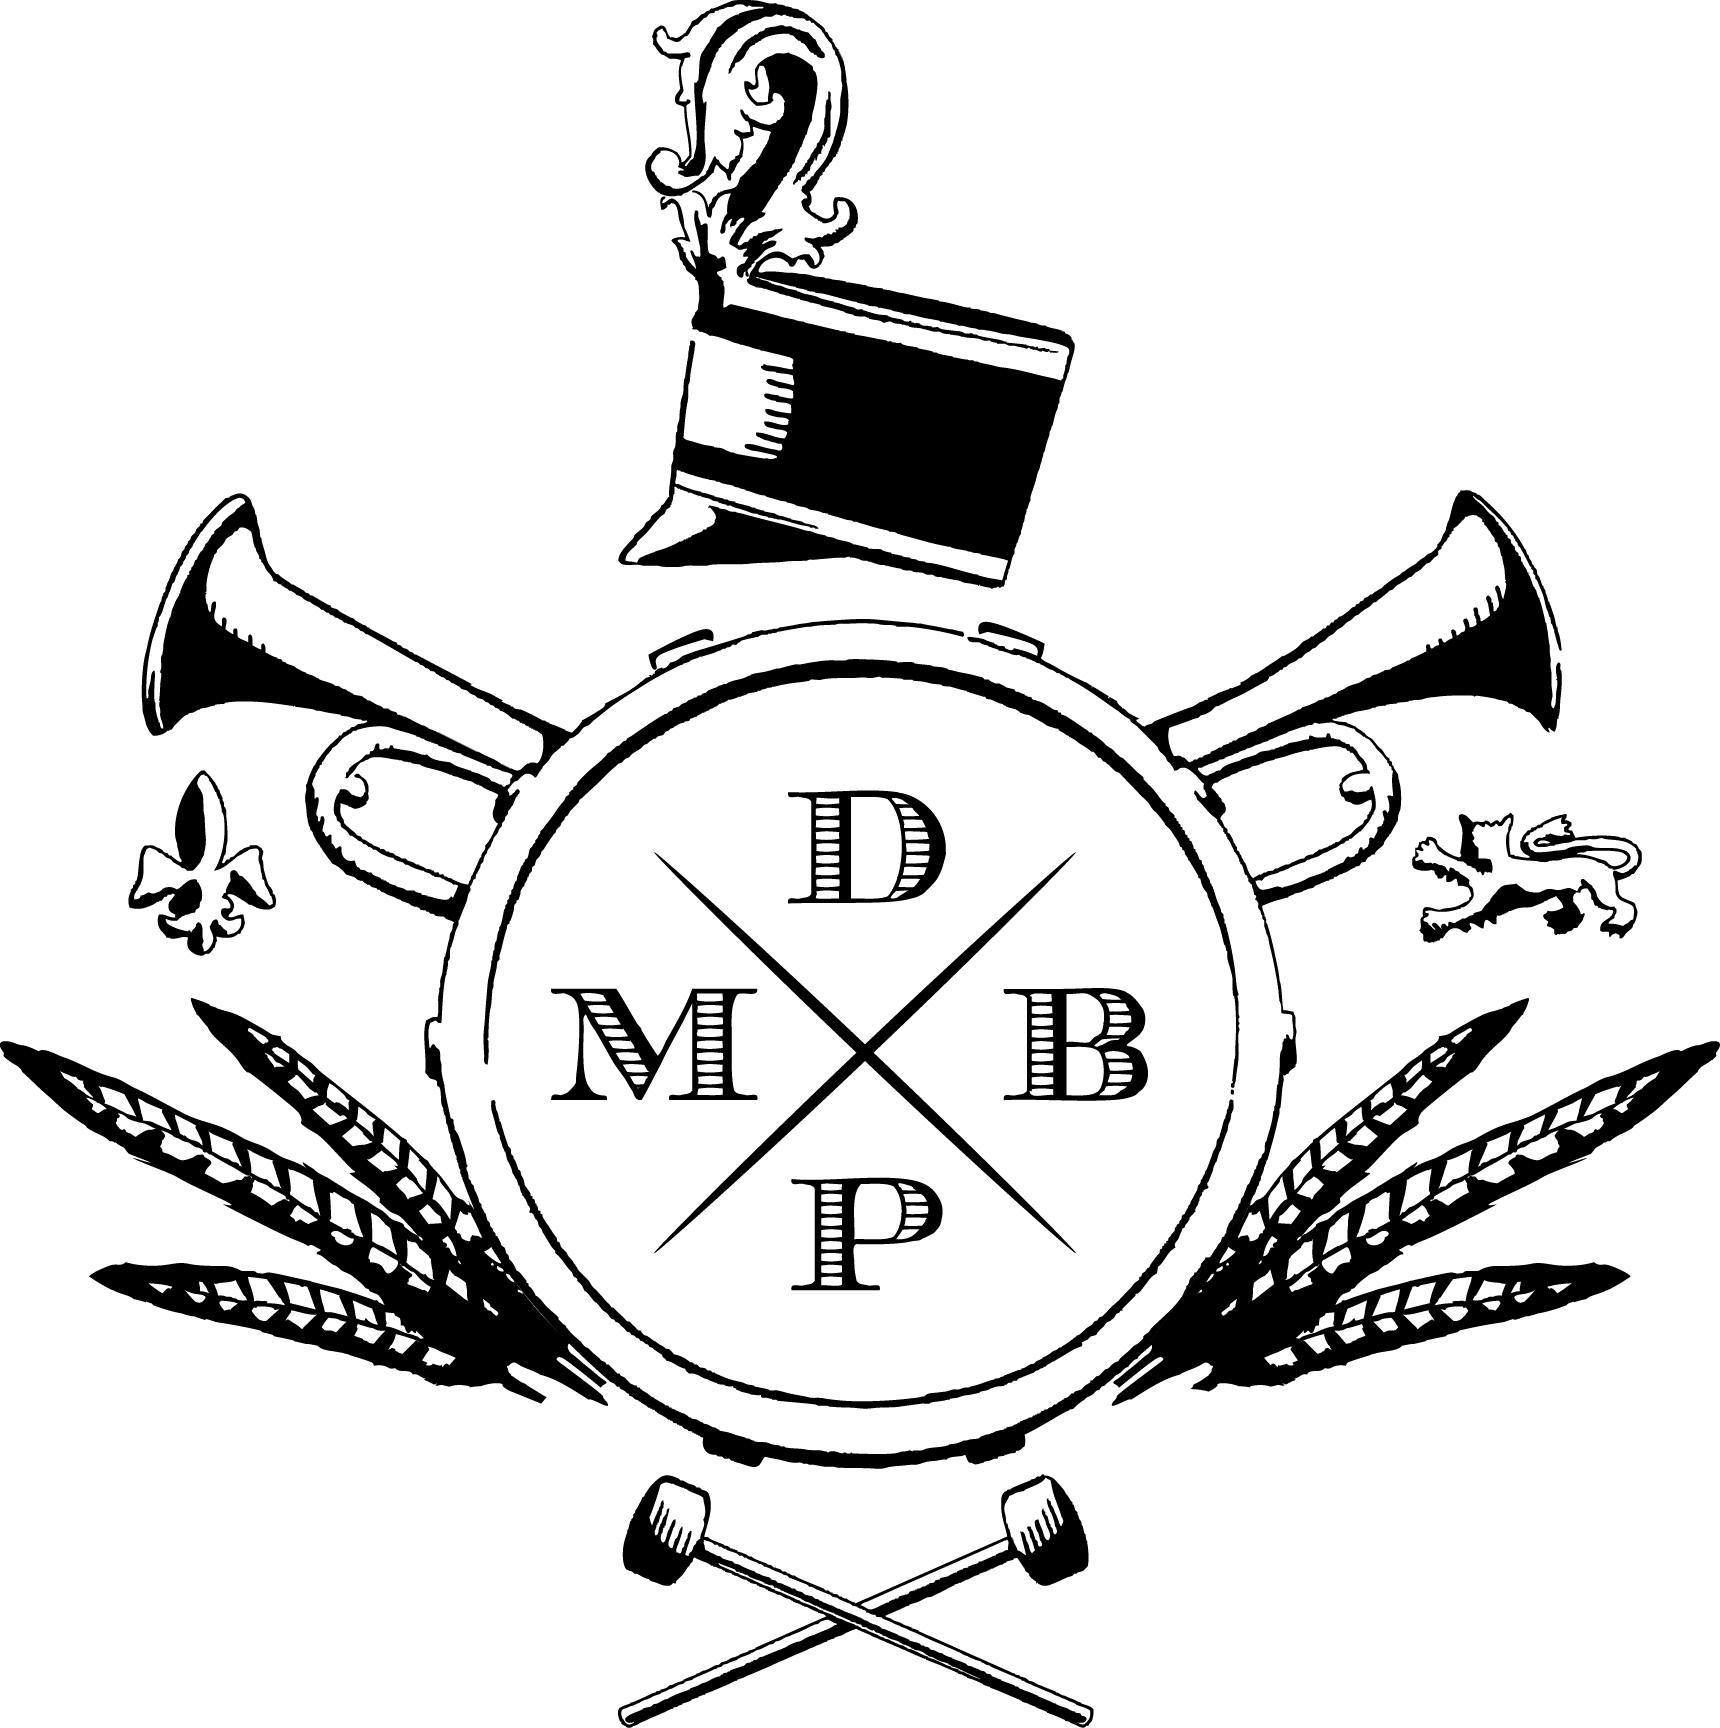 marching band logo.